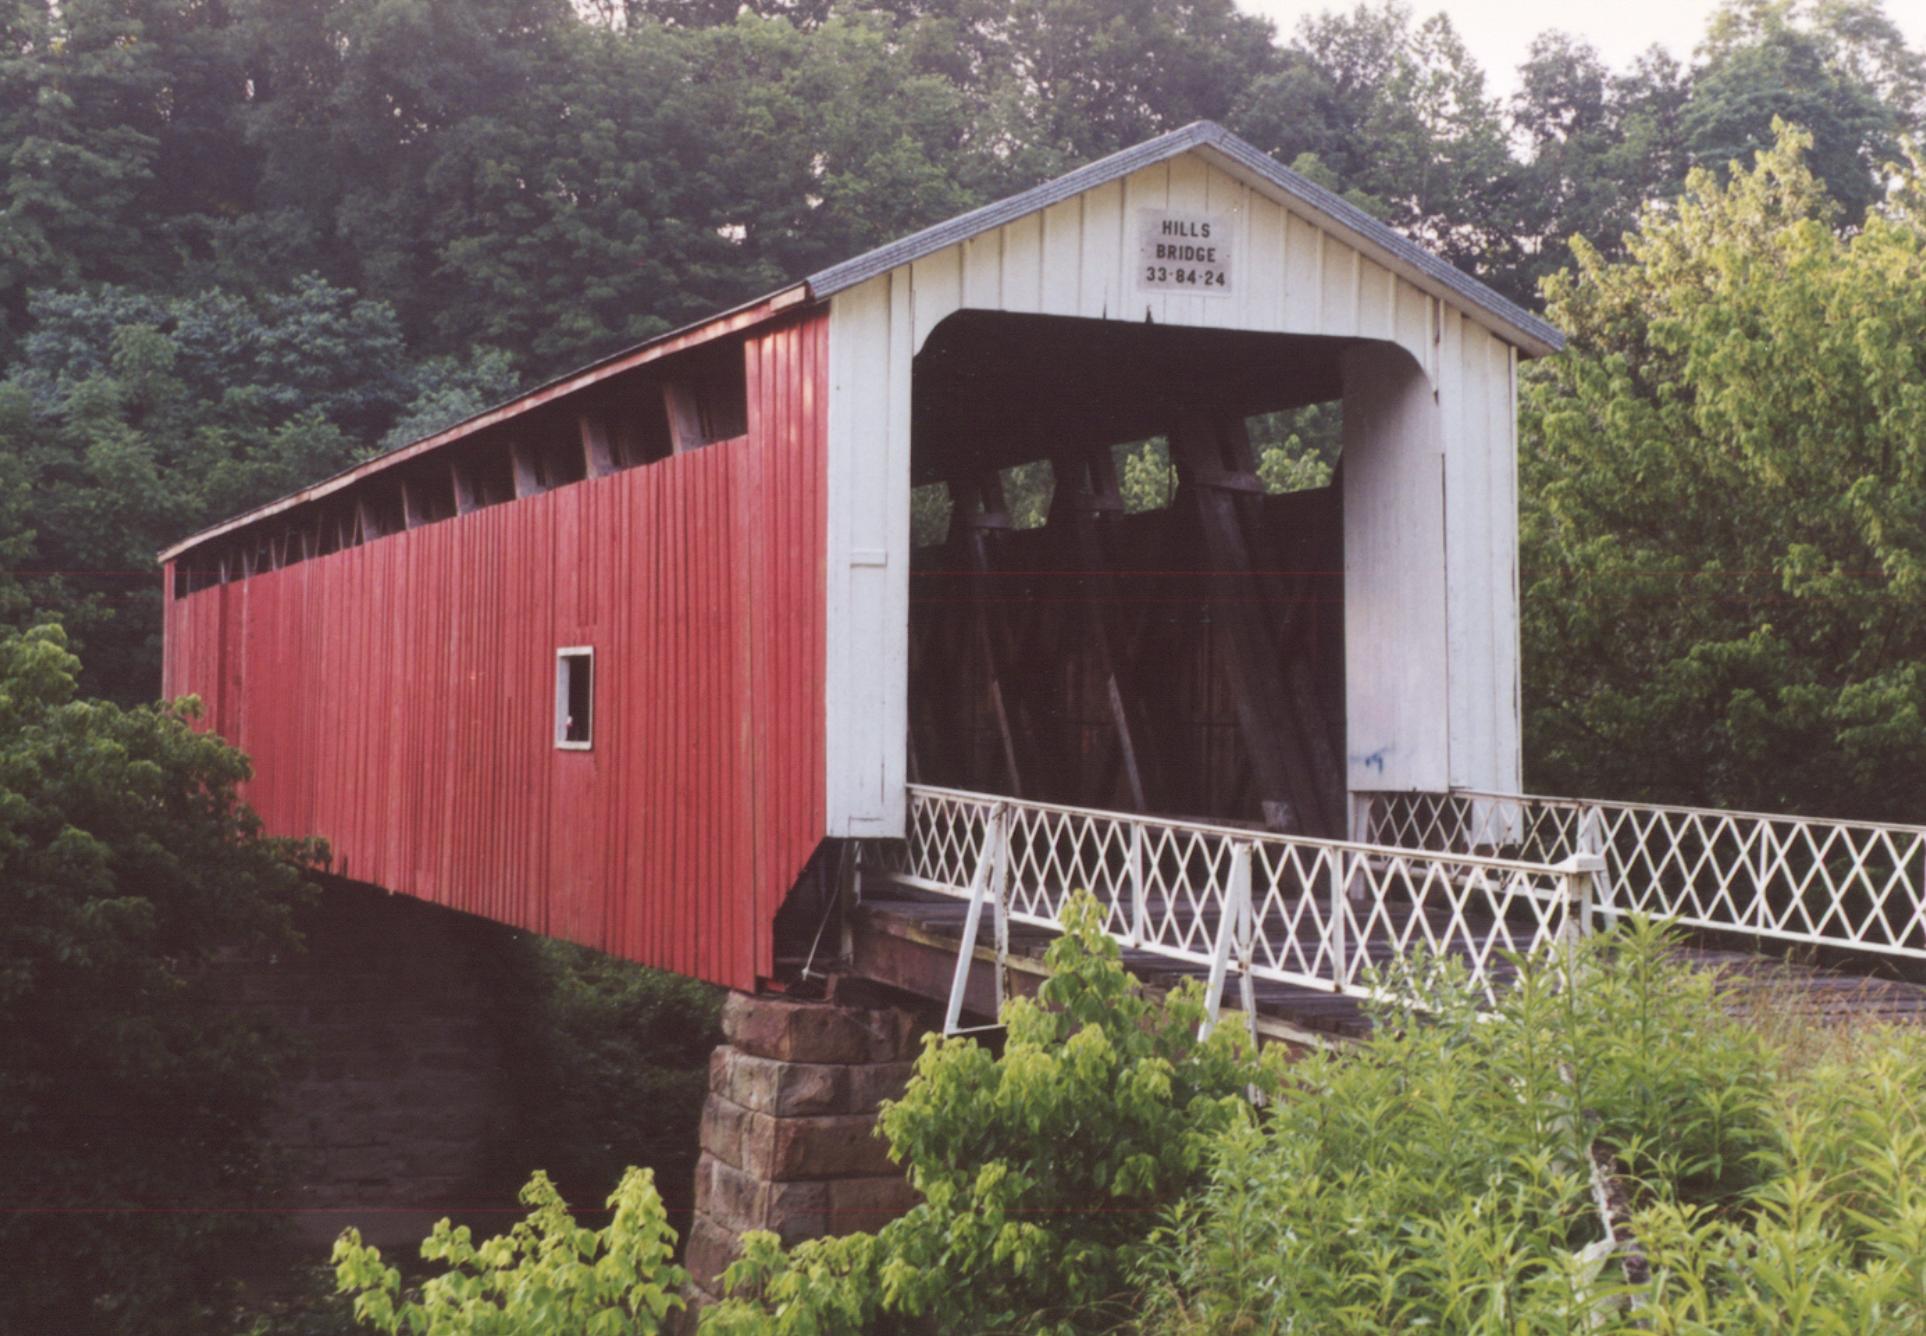 Coshocton Ohio datant